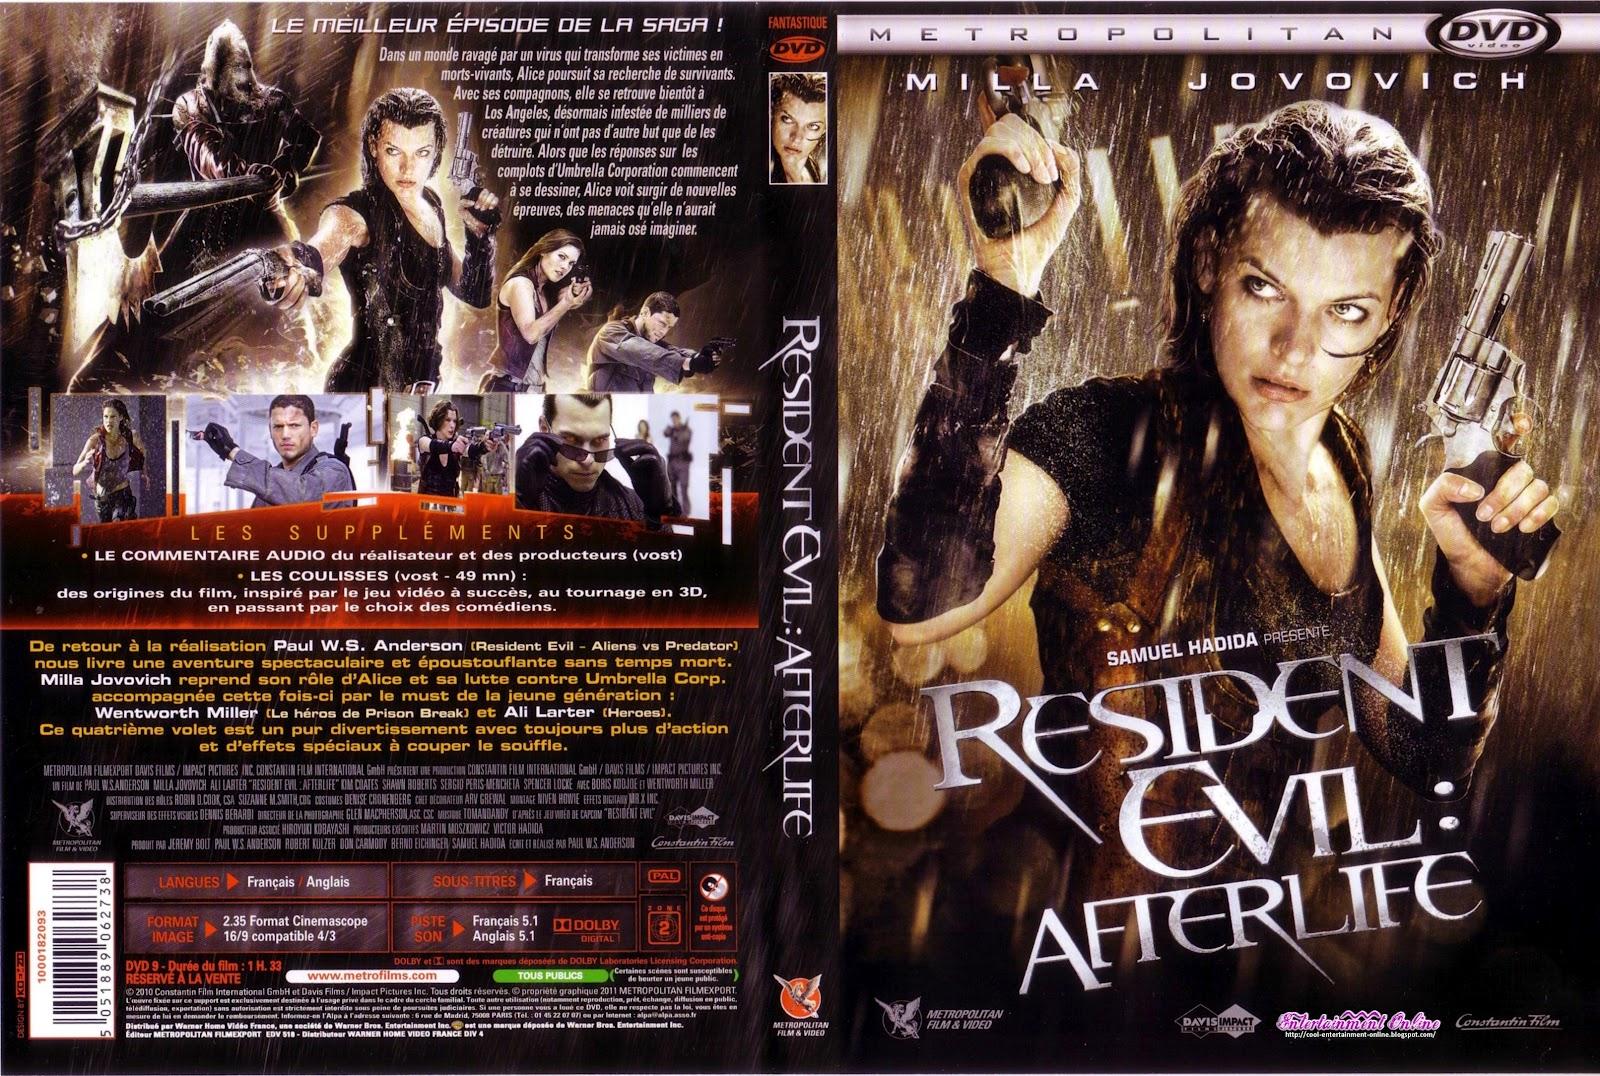 http://3.bp.blogspot.com/-SBqf_6YUe0U/T_TFUitqMiI/AAAAAAAAAx4/I-o2EAUbQQY/s1600/Resident+Evil+Afterlife.jpg